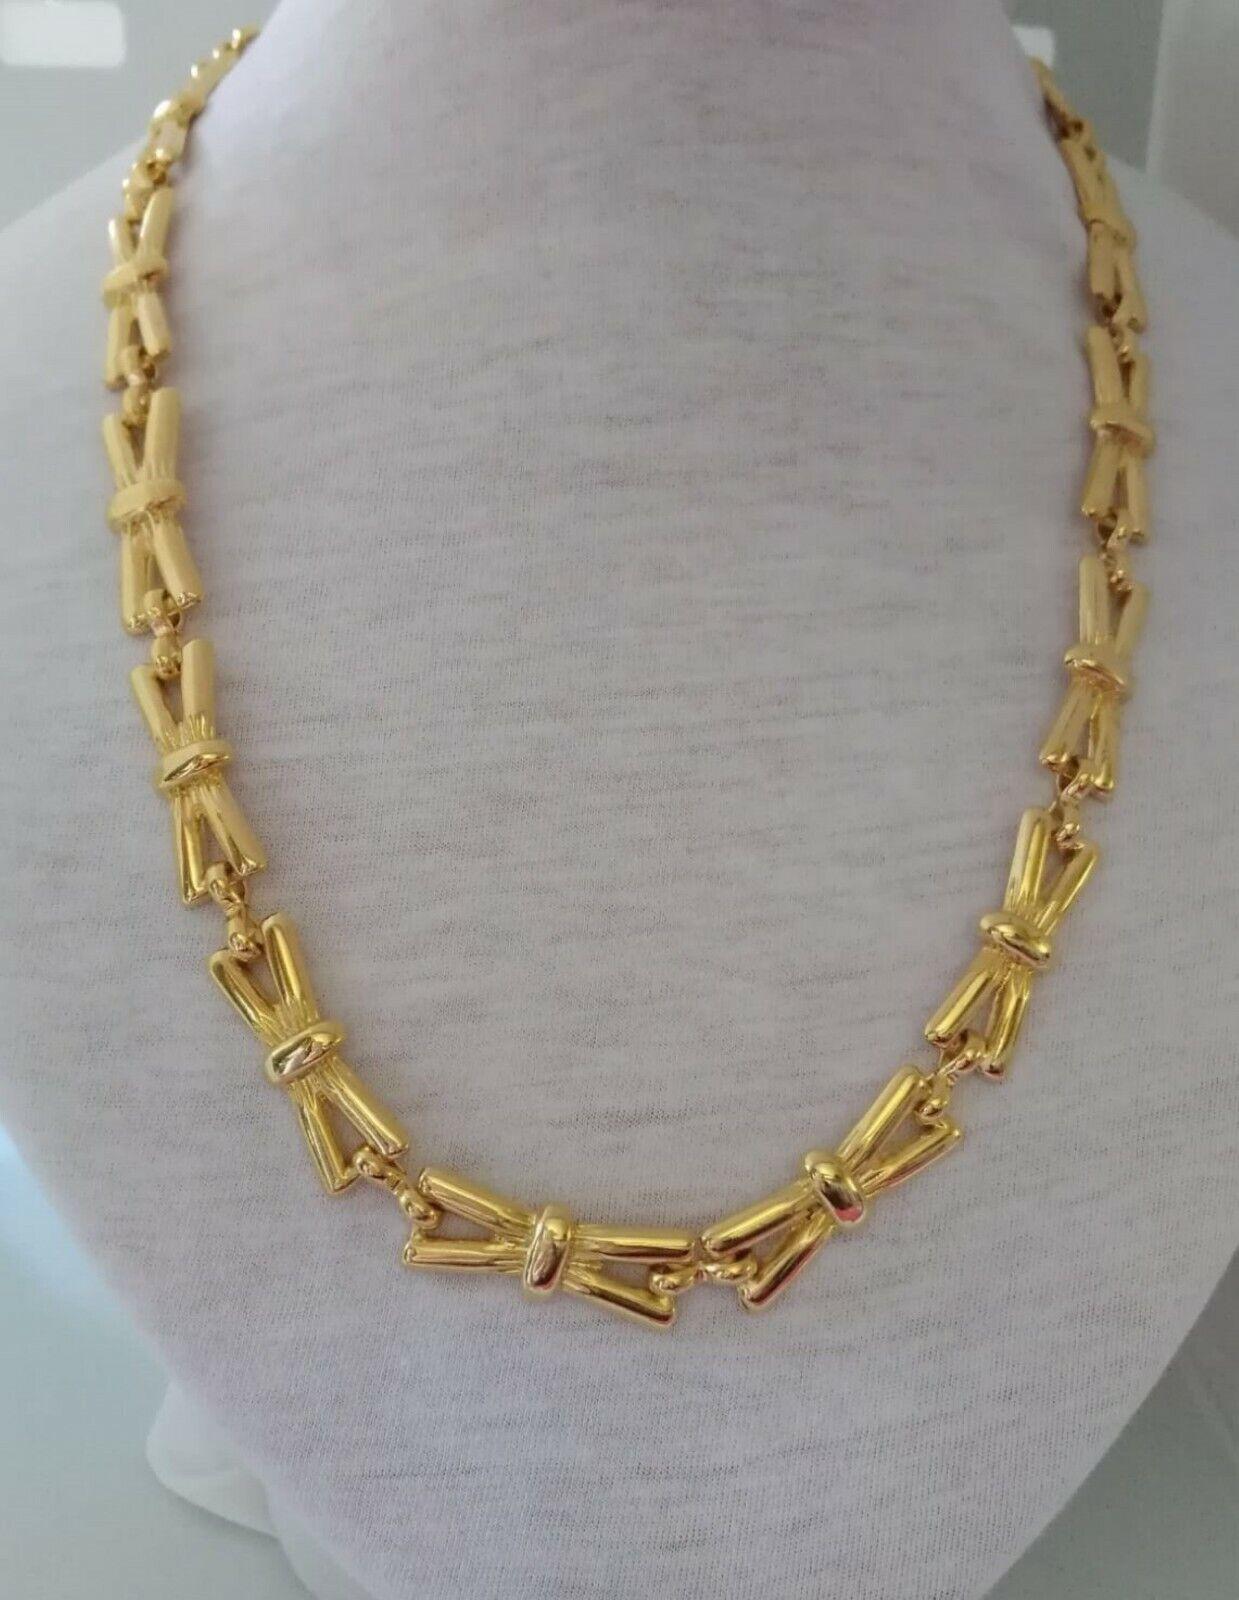 Vintage Long Necklace Vintage Years 70/80 Metal Gold Color Necklace Woman-show original title